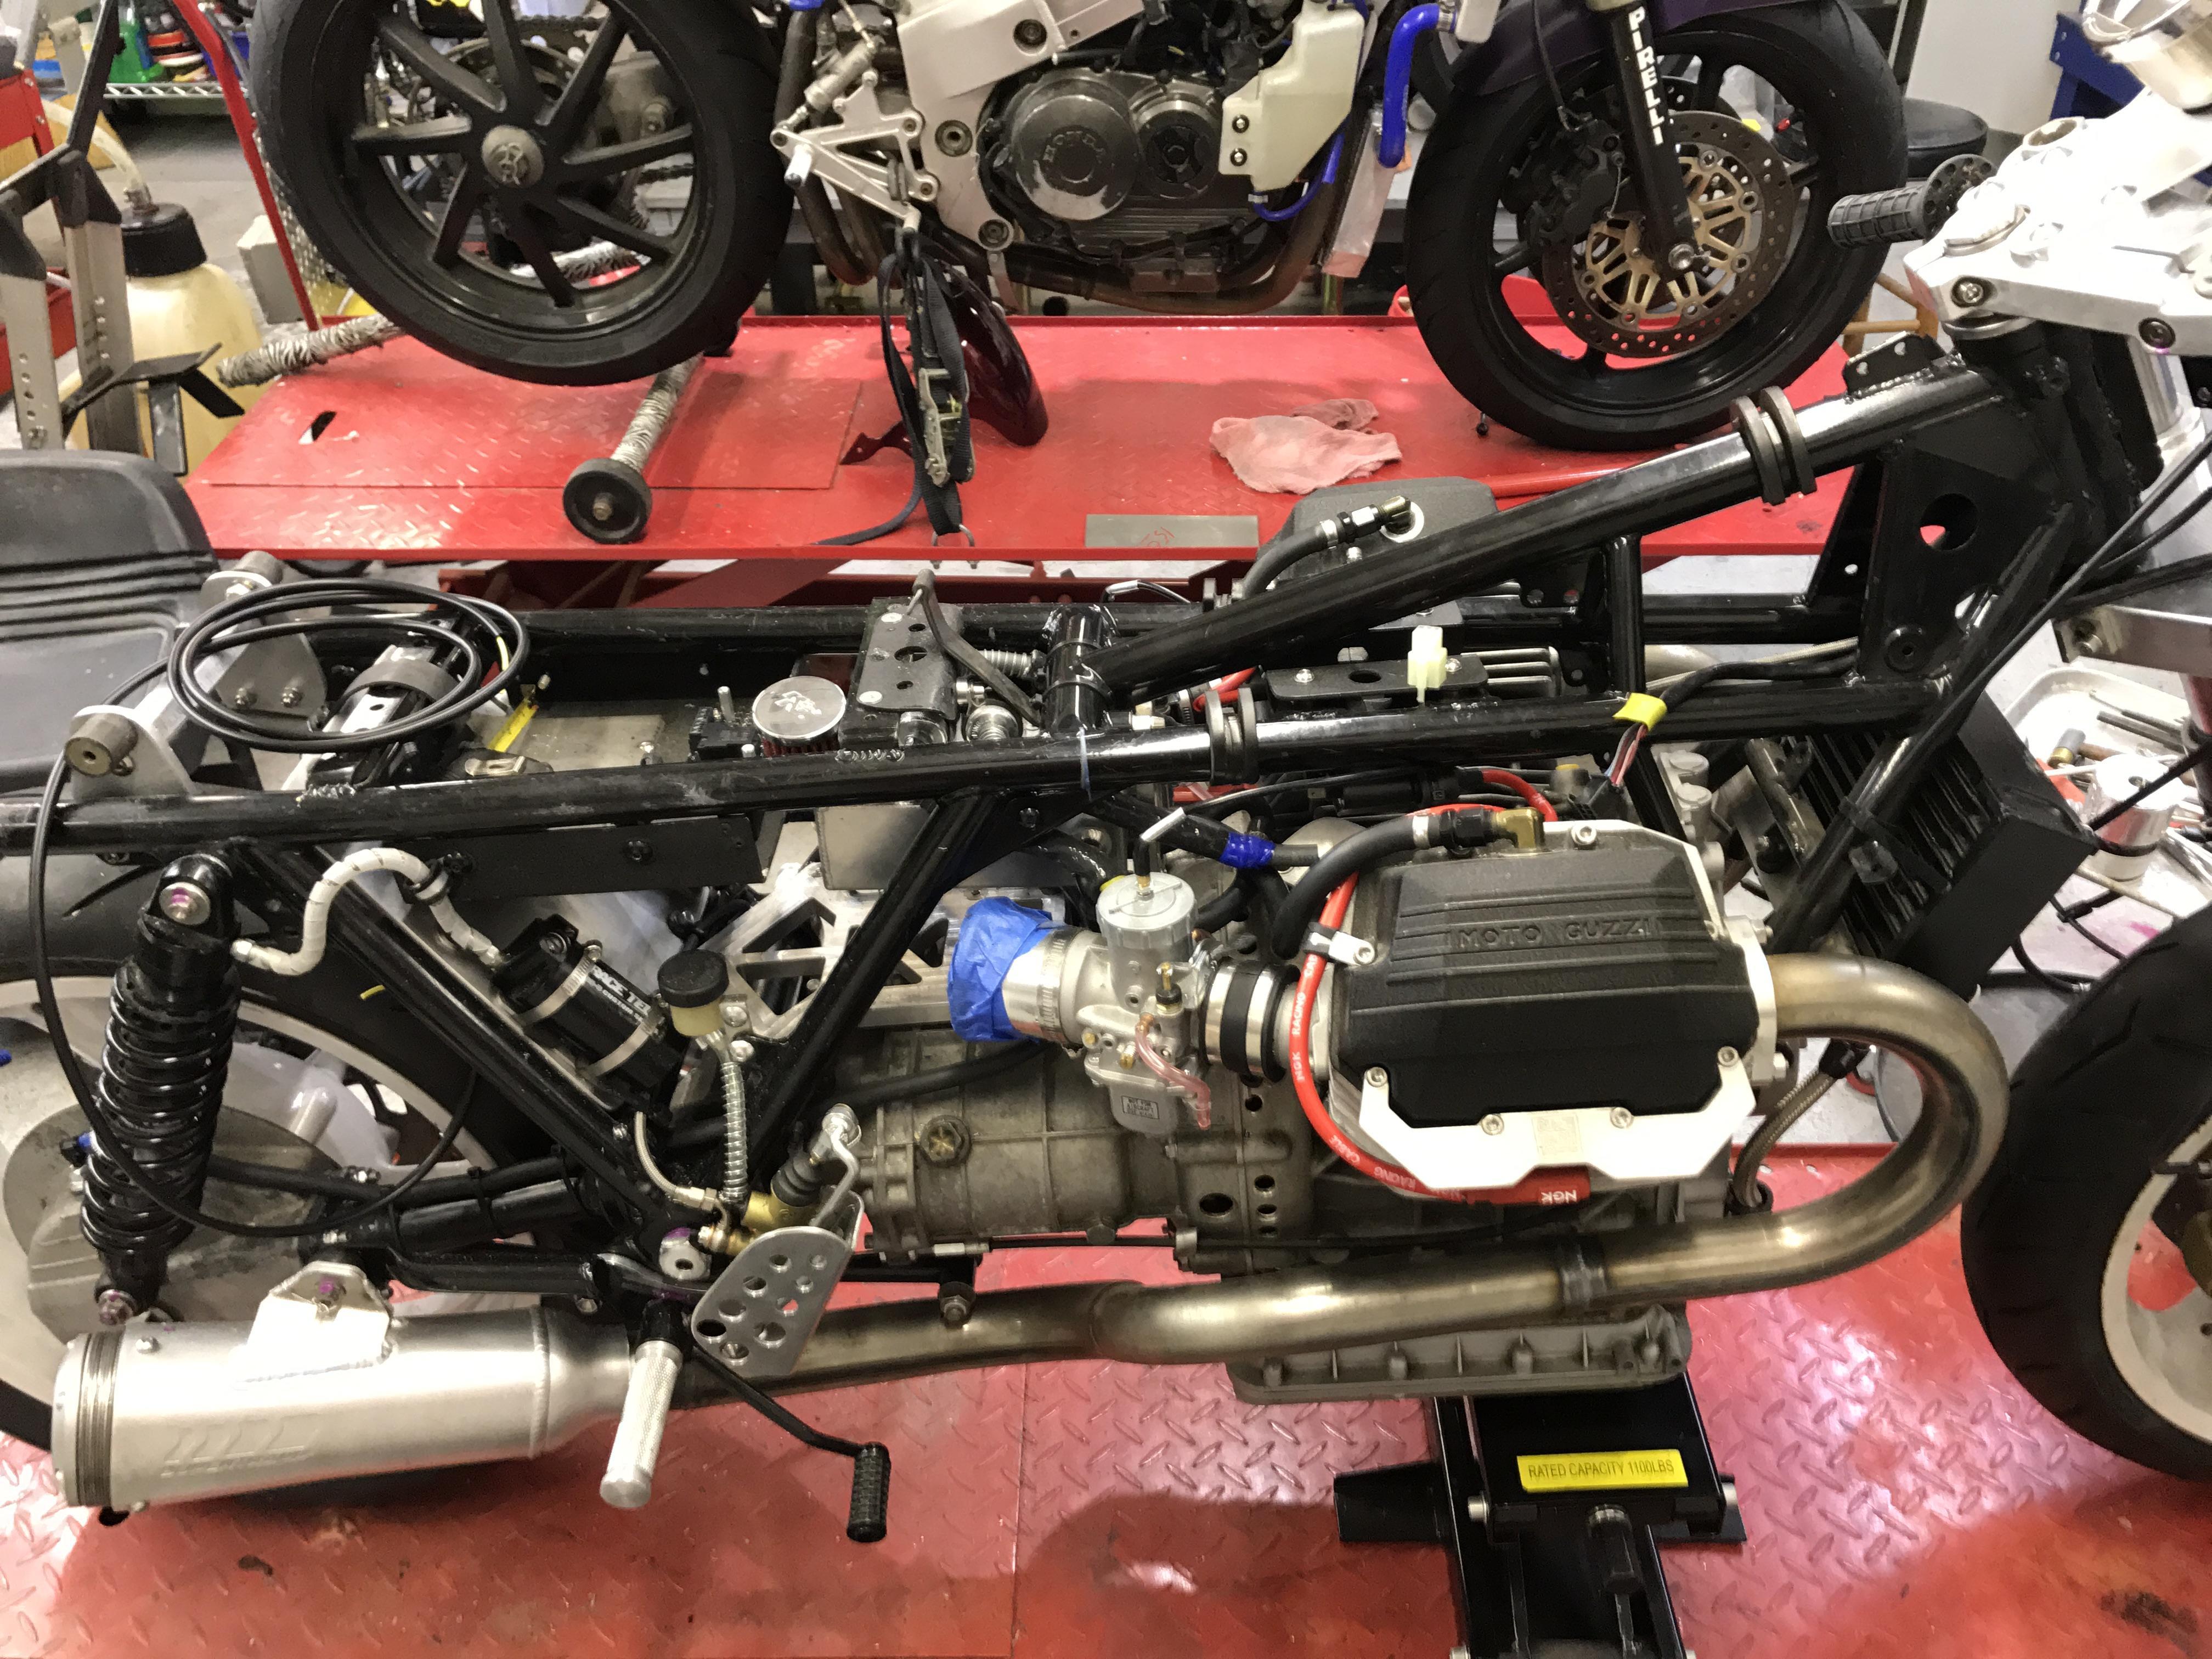 Iom Bike Help Technical Topics Moto Guzzi Forum Ducati St3s Wiring Diagram 2017 11 2620170428